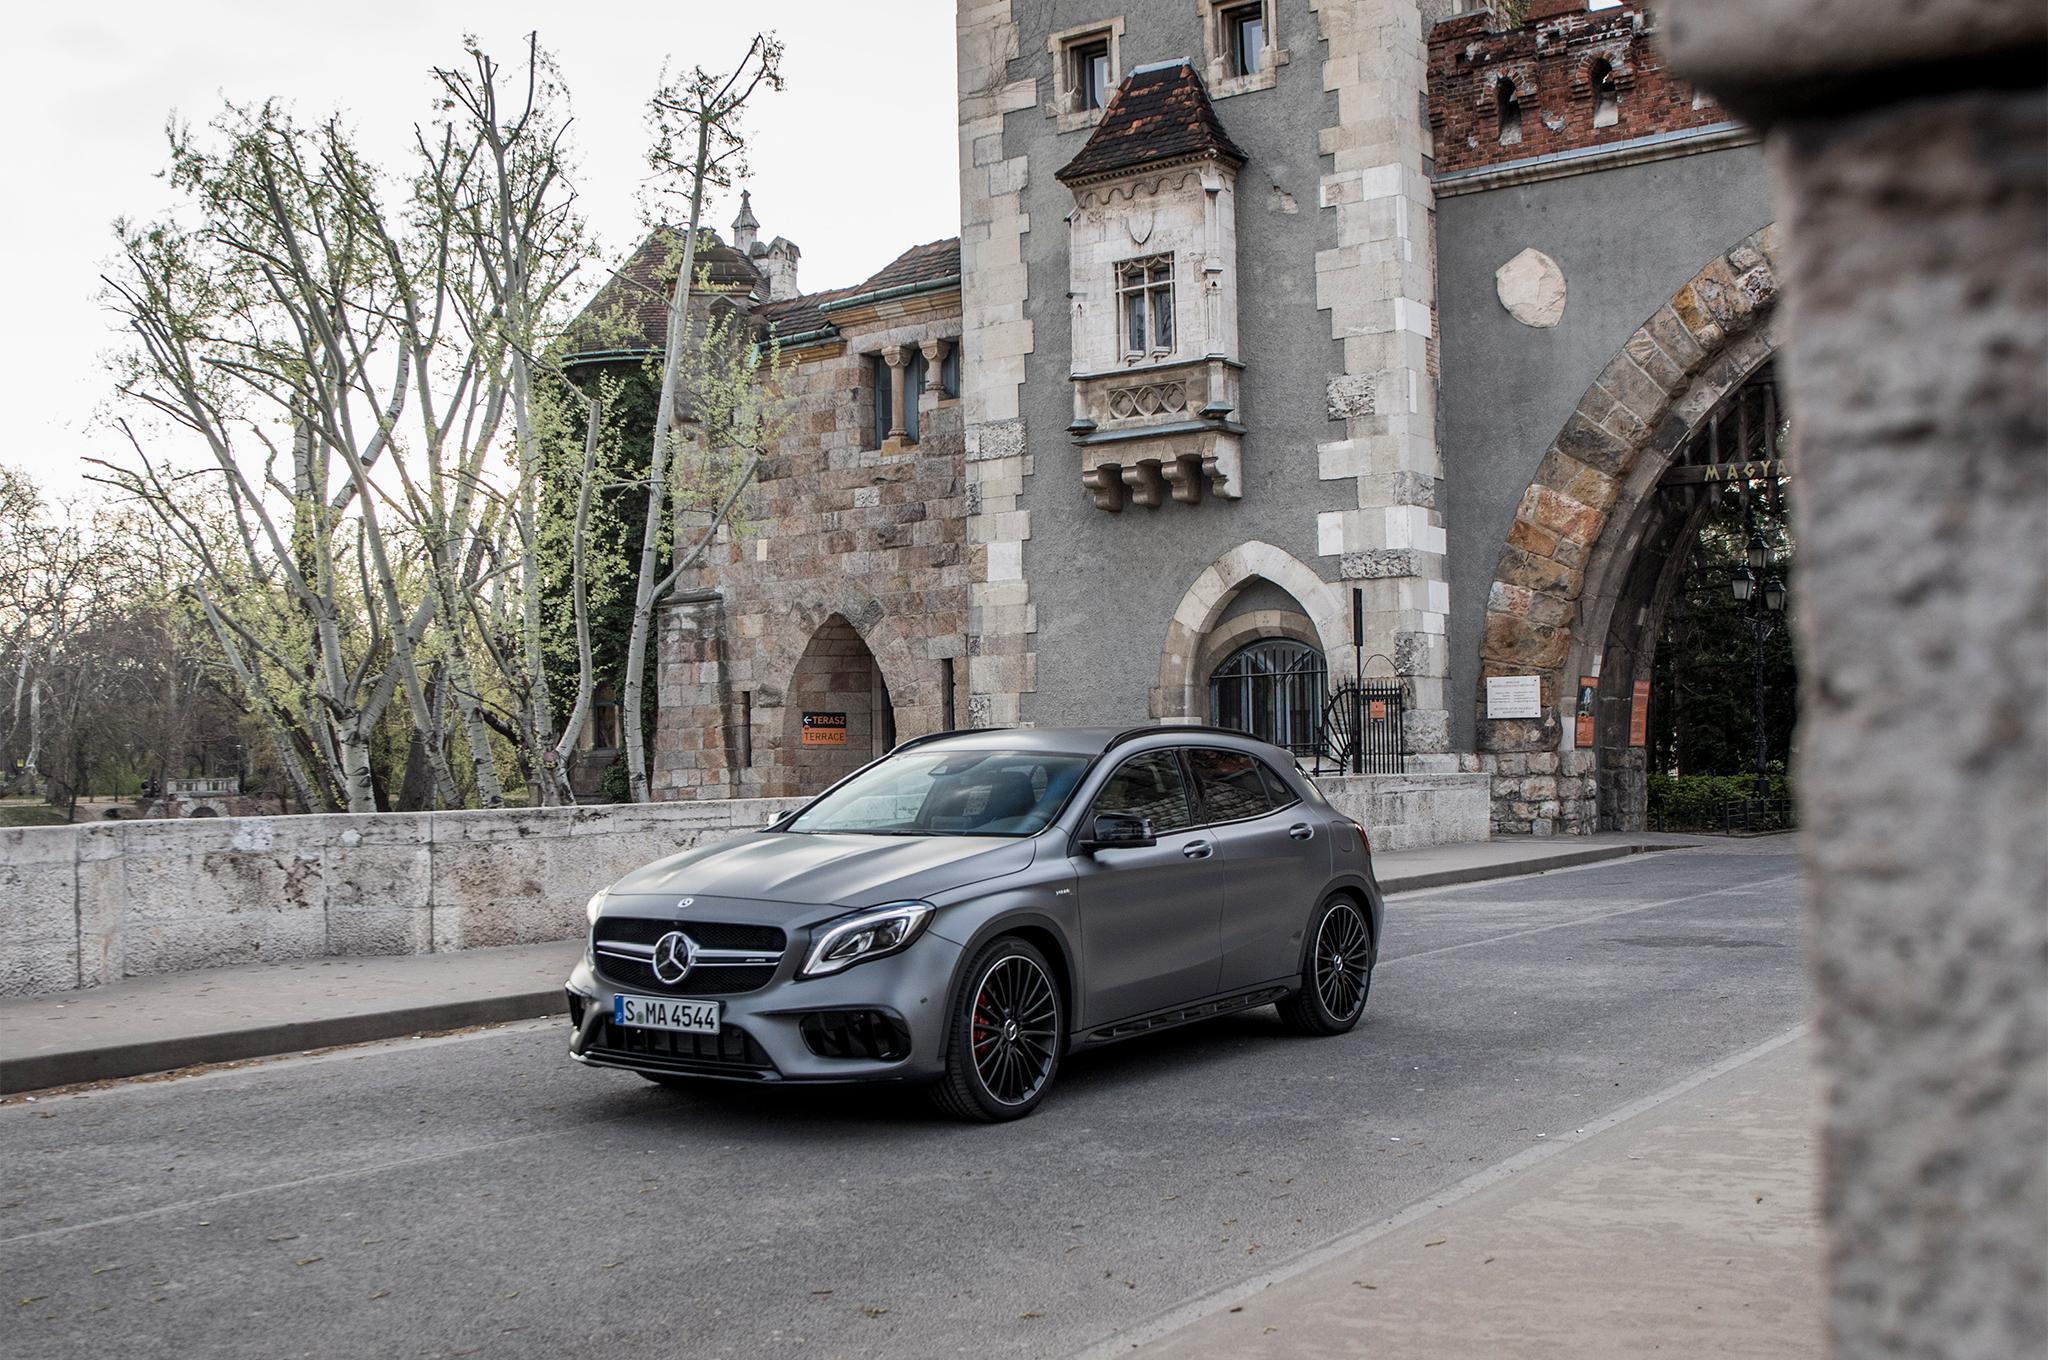 2018-Mercedes-AMG-GLA45-4MATIC-front-three-quarter-05